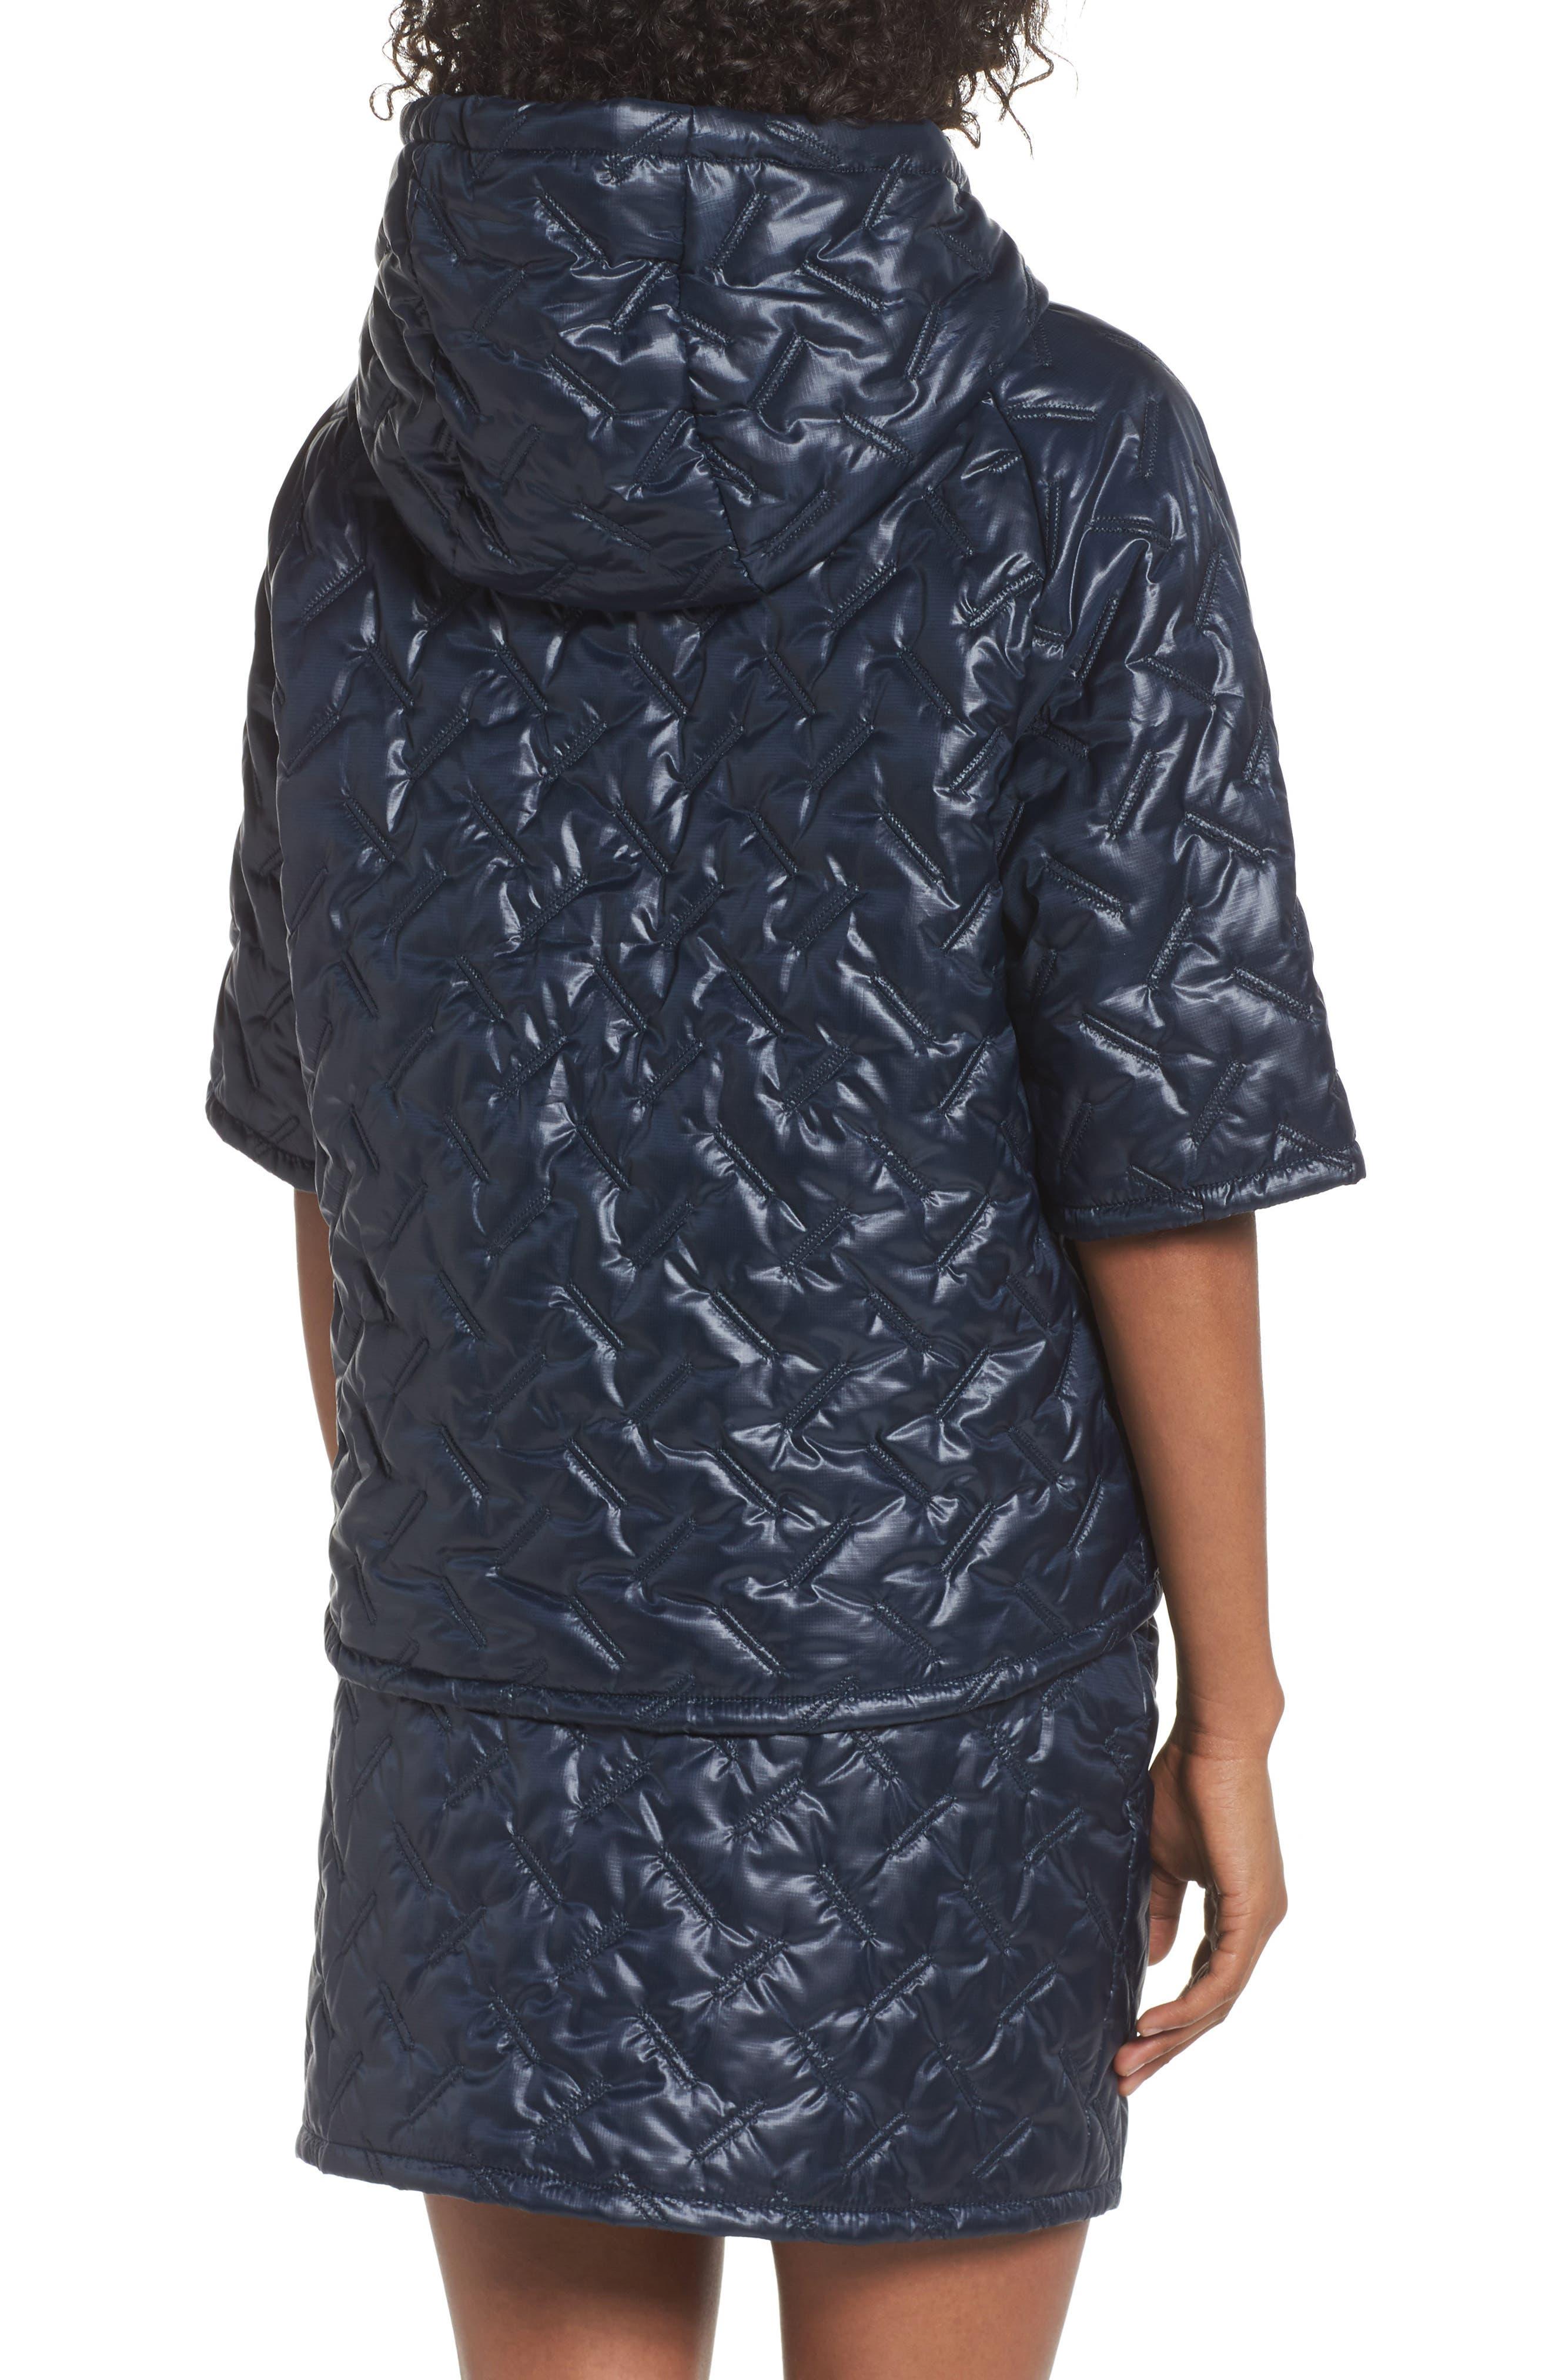 NikeLab Essentials Insulated Short Sleeve Women's Hoodie,                             Alternate thumbnail 2, color,                             Dark Obsidian/ Black